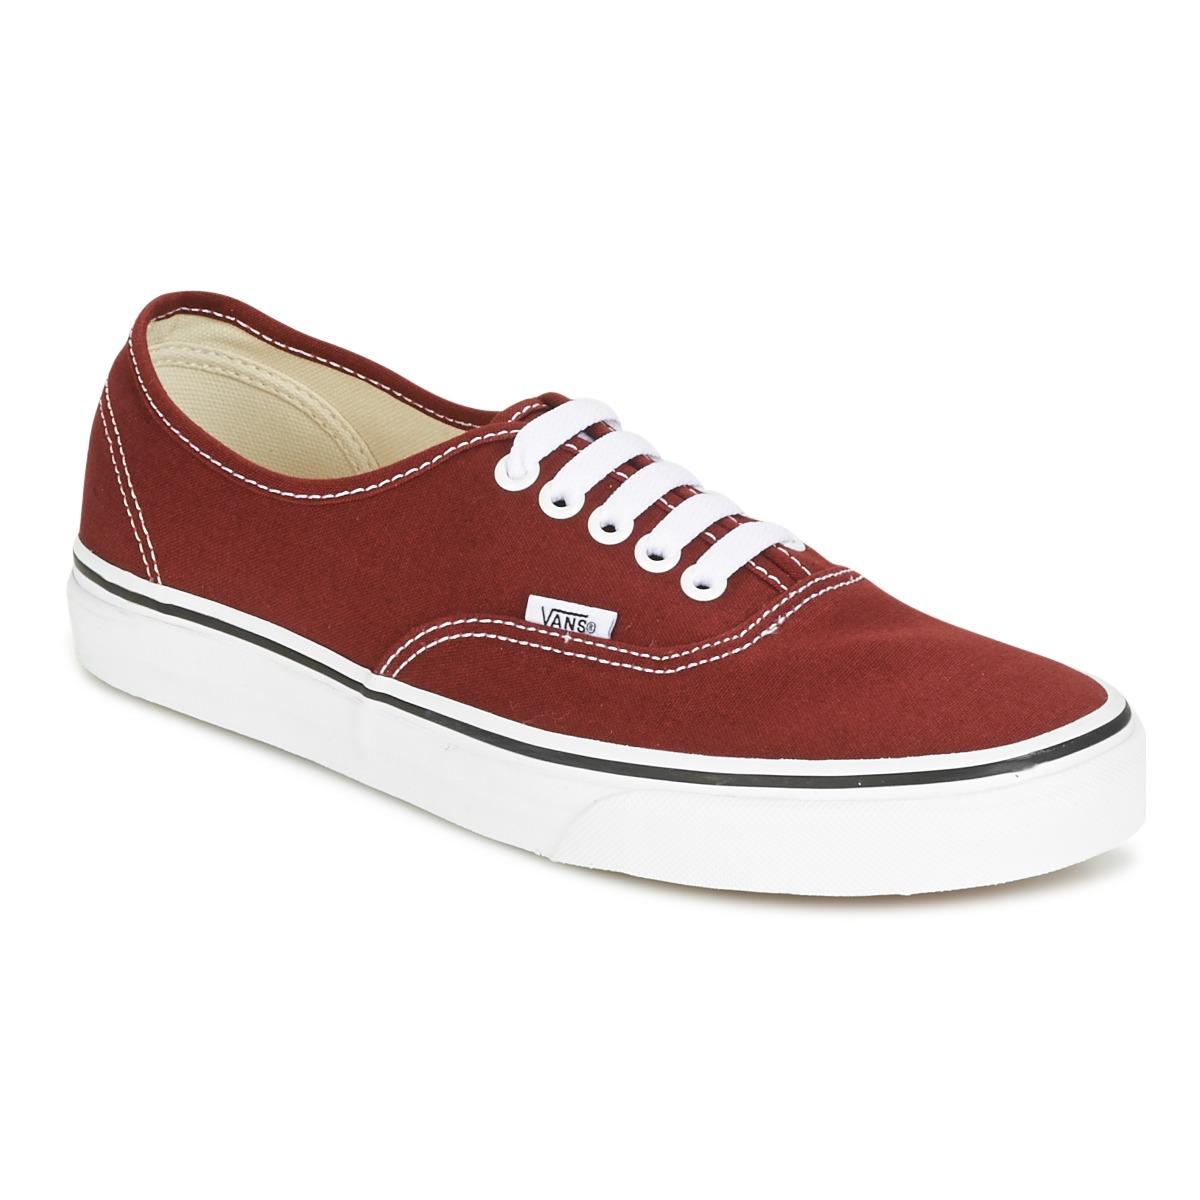 Vans AUTHENTIC Rot - Kostenloser Versand bei Spartoode ! - Schuhe Sneaker Low  55,99 €